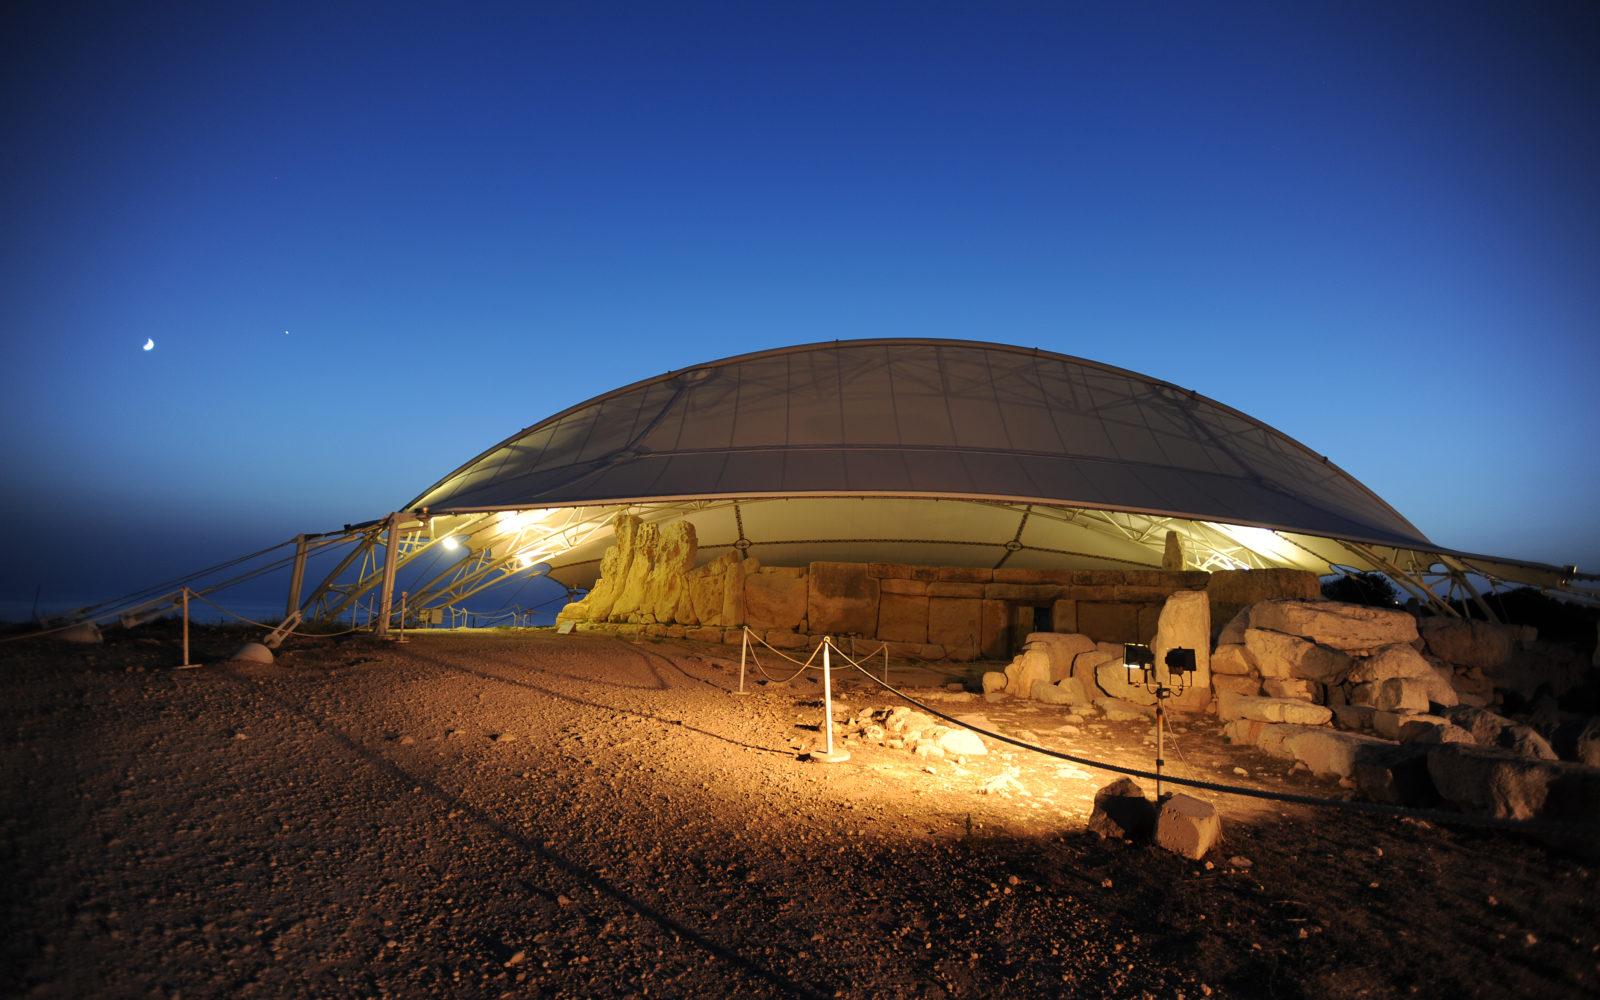 Ħaġar Qim & Mnajdra Temples awarded Tripadvisor's Travelers' Choice